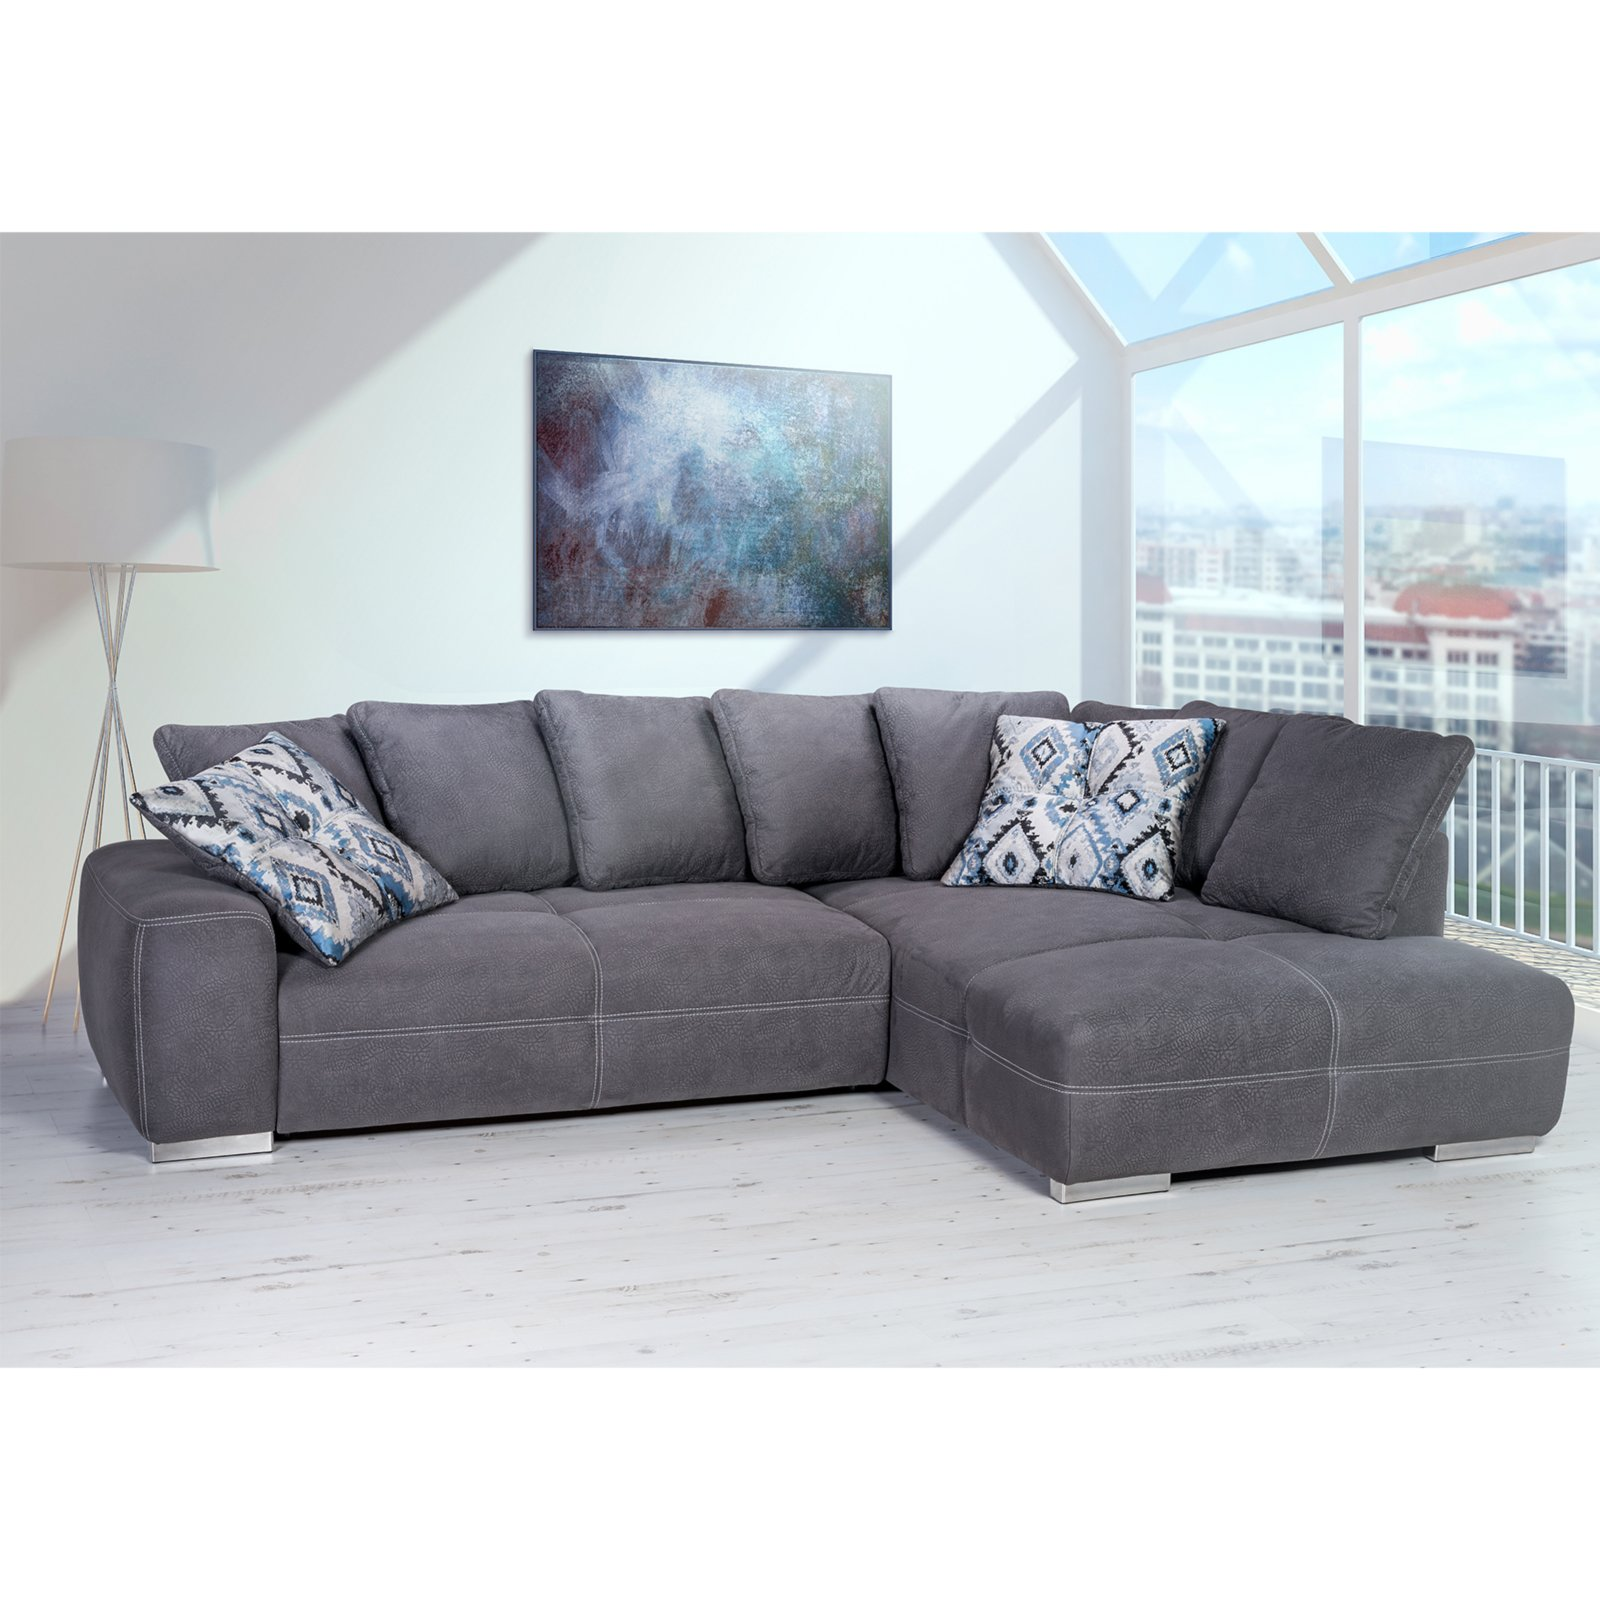 ecksofa grau mit liegefunktion ebay. Black Bedroom Furniture Sets. Home Design Ideas